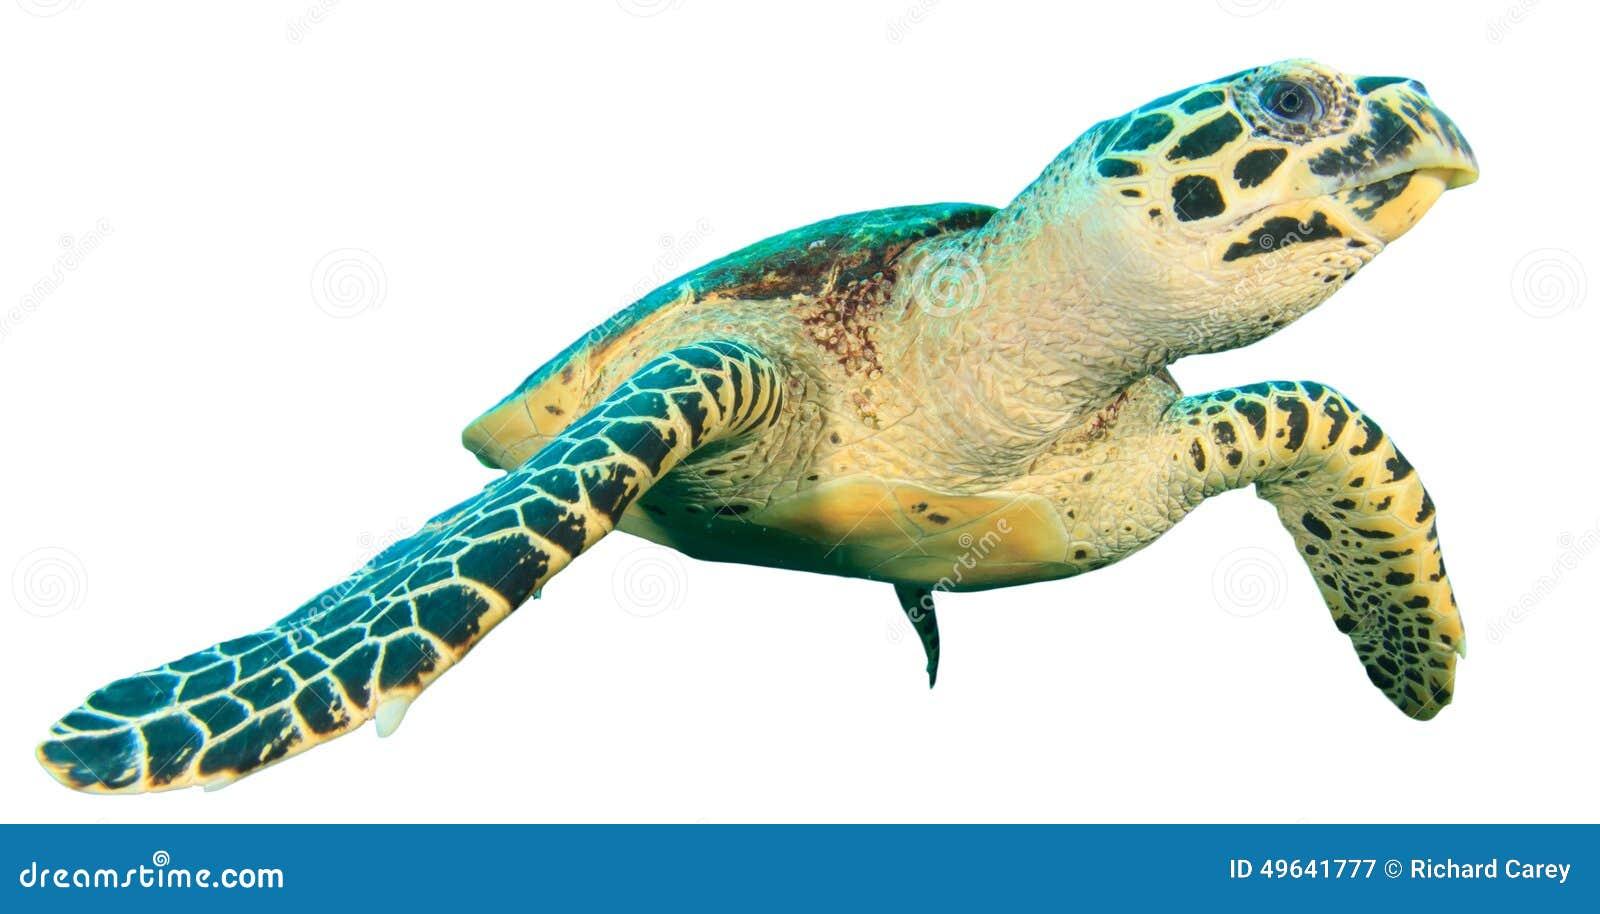 turtle white background - photo #42